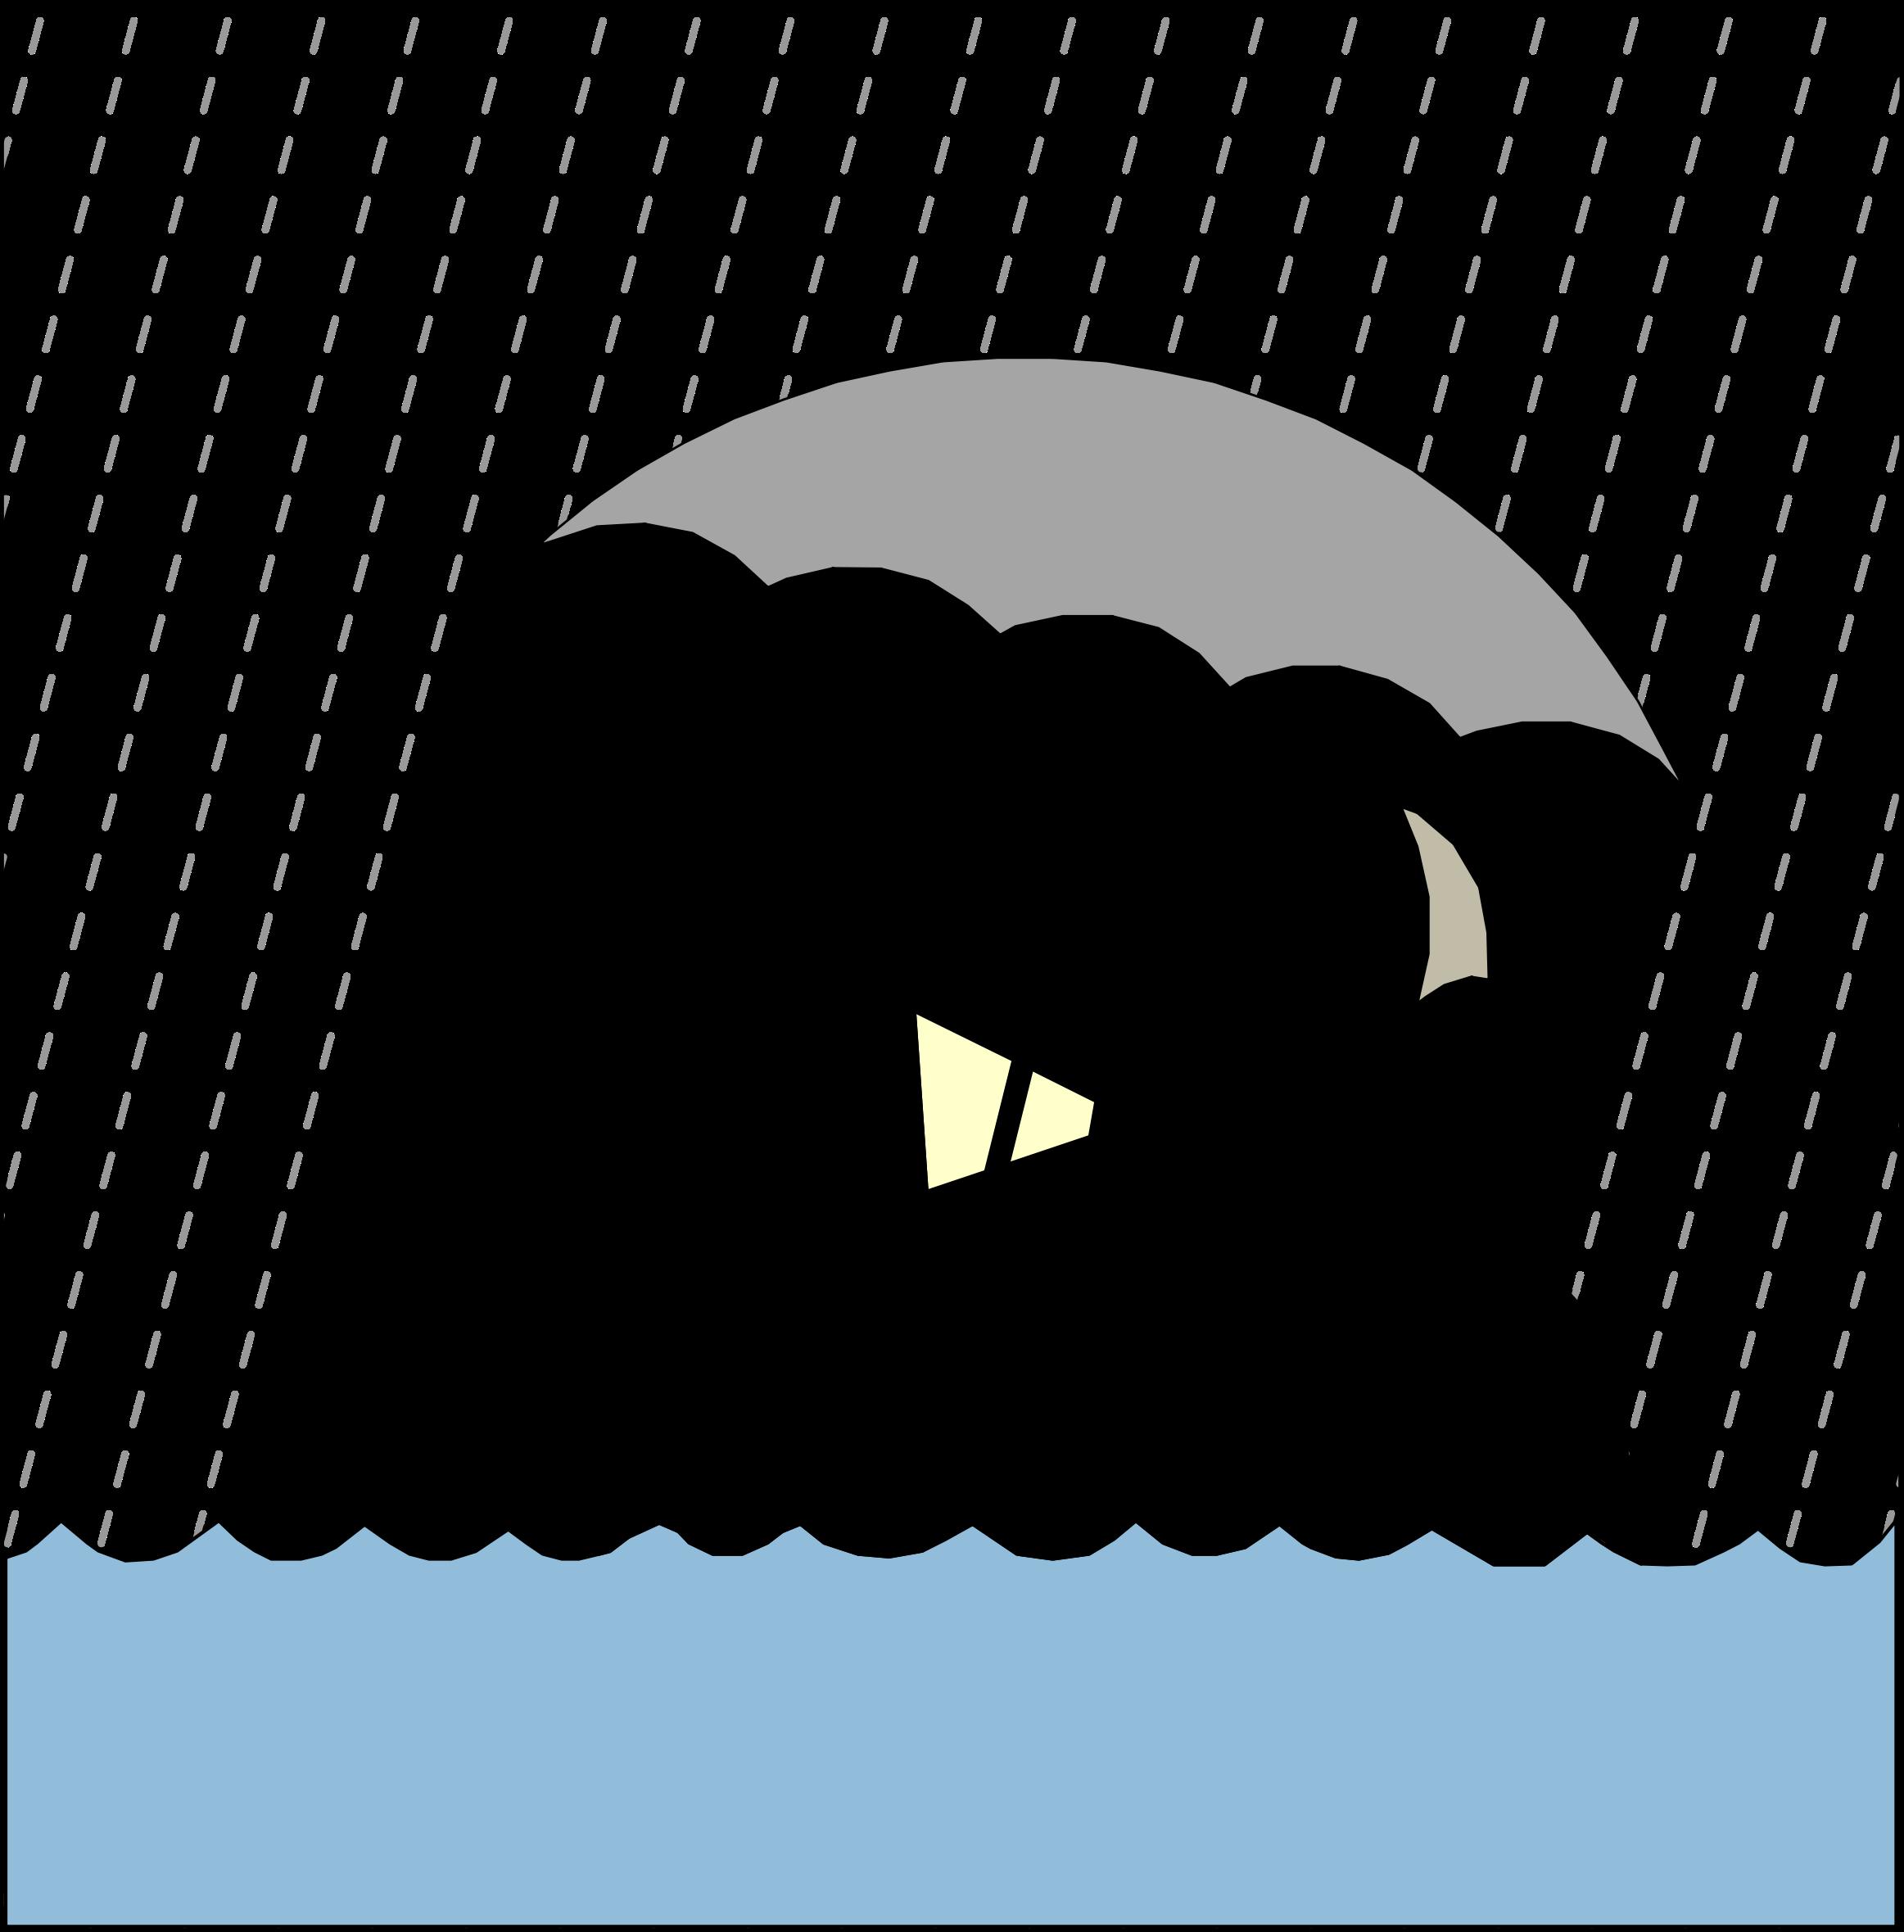 Raining animation big image. Clipart rain cartoon